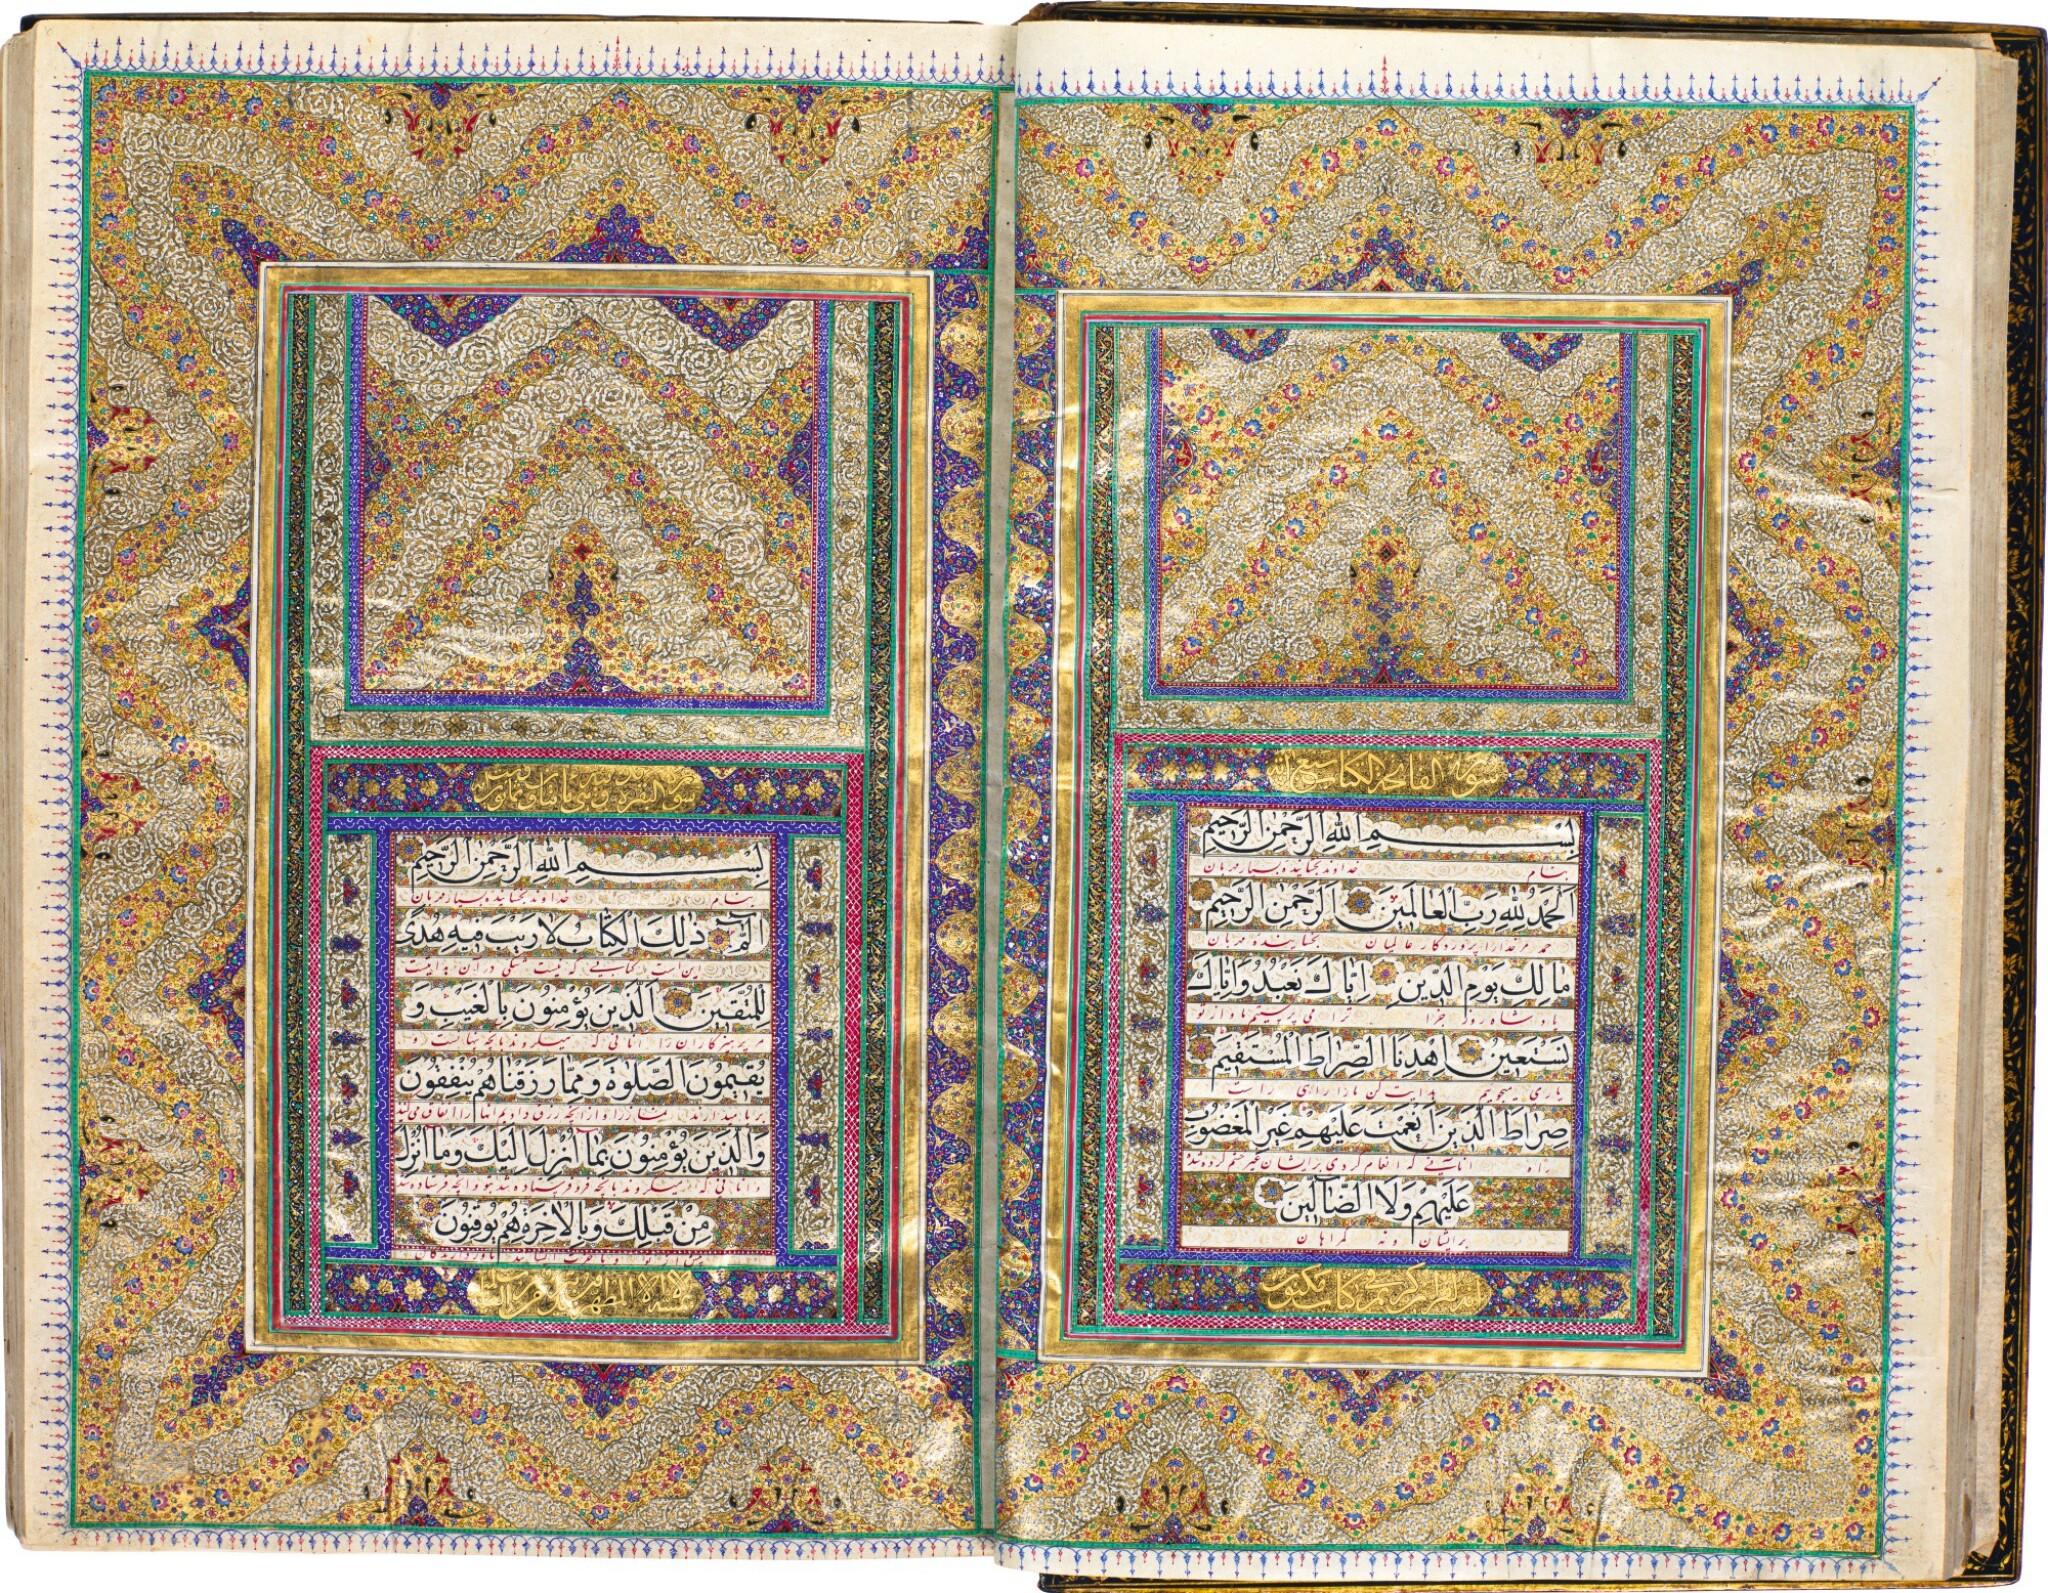 View full screen - View 1 of Lot 79. A LARGE AND FINELY-ILLUMINATED QUR'AN, COPIED BY MUHAMMAD SHAFI' B. 'ALI ASKAR AL-ARSANJANI, THE ILLUMINATION ATTRIBUTED TO REZA SANI' HUMAYUN, PERSIA, QAJAR, DATED 1283 AH/1866-67 AD.